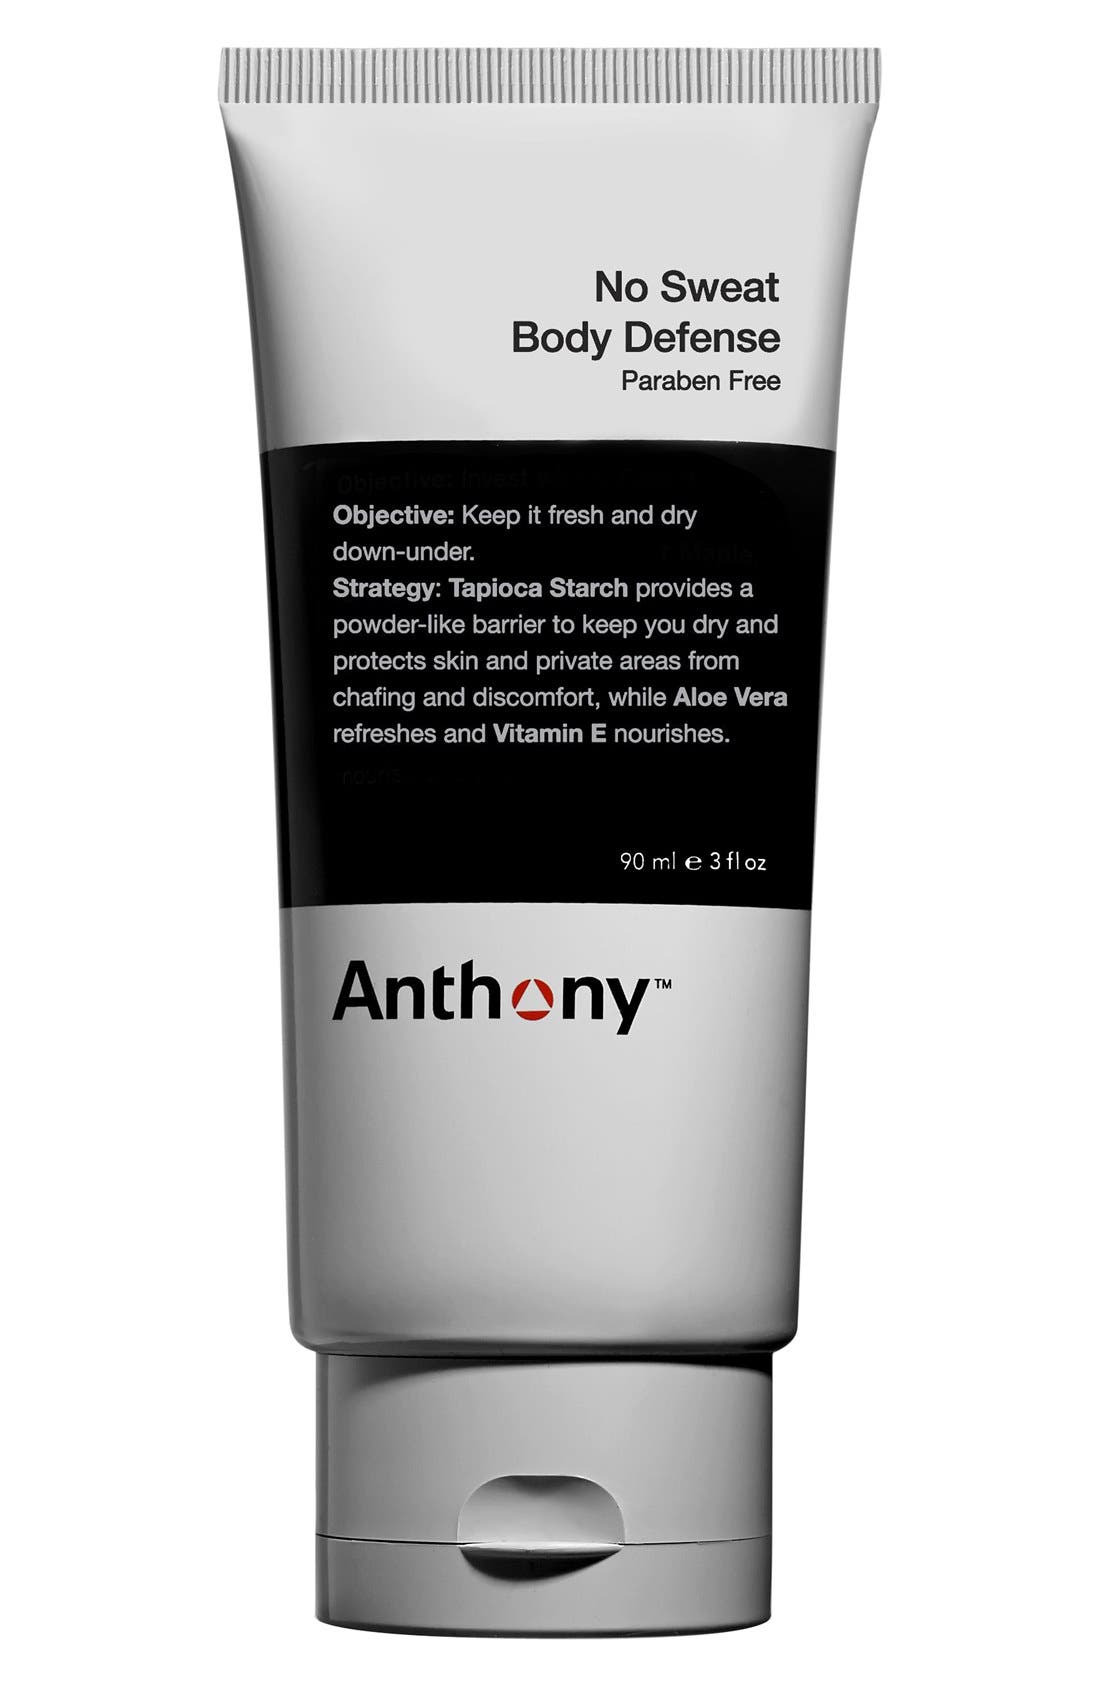 Anthony™ 'No Sweat' Body Defense